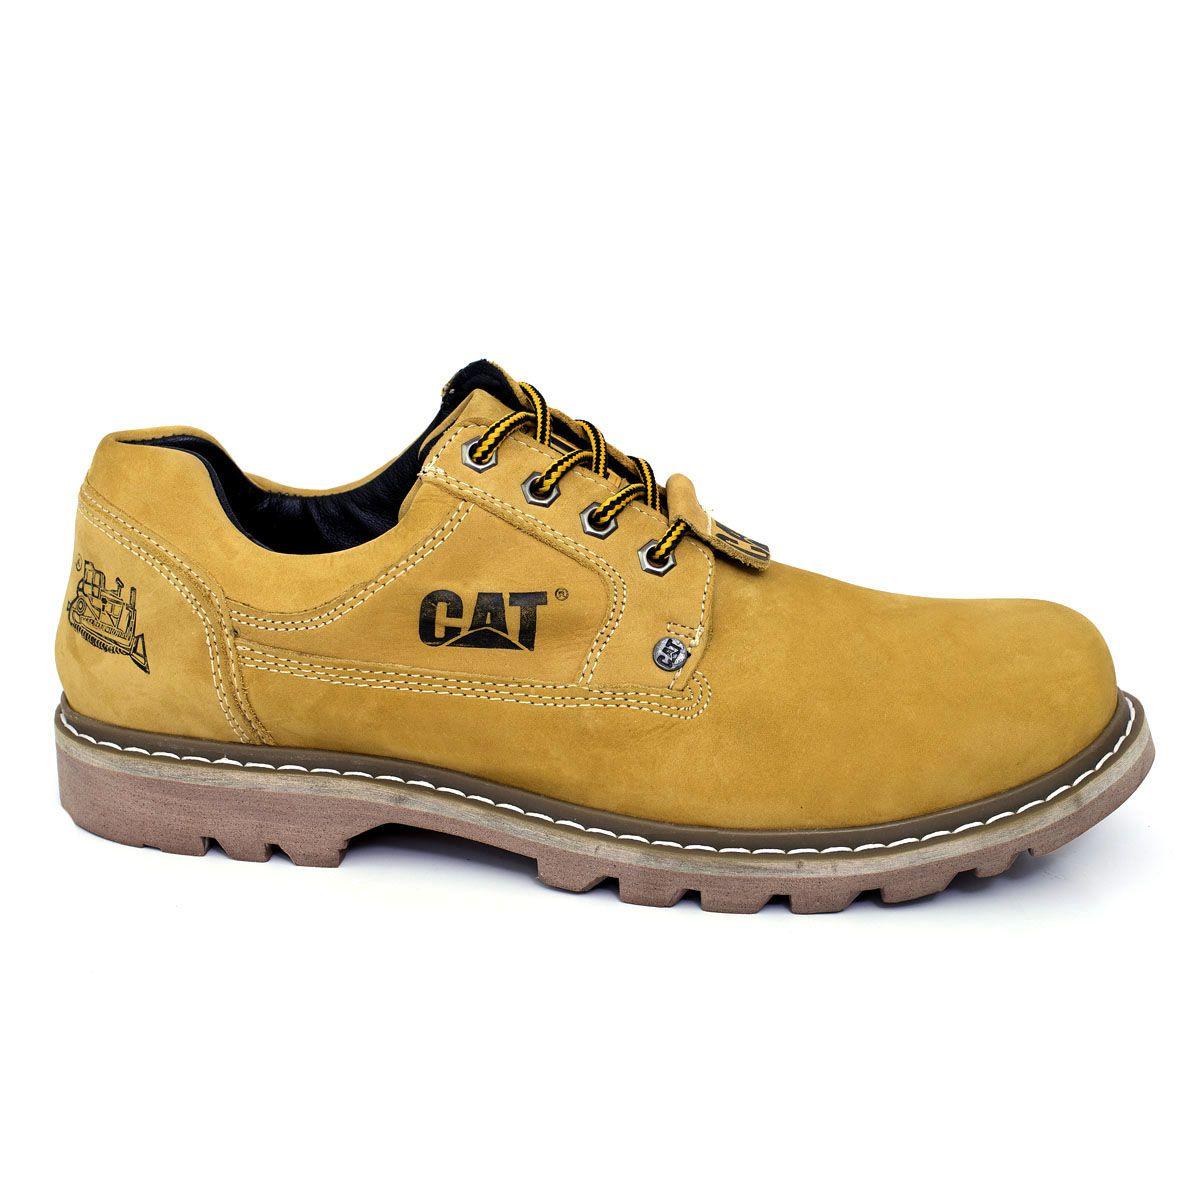 85284b5ff4 Sapato Tênis Caterpillar Second Shift Couro - Yellow